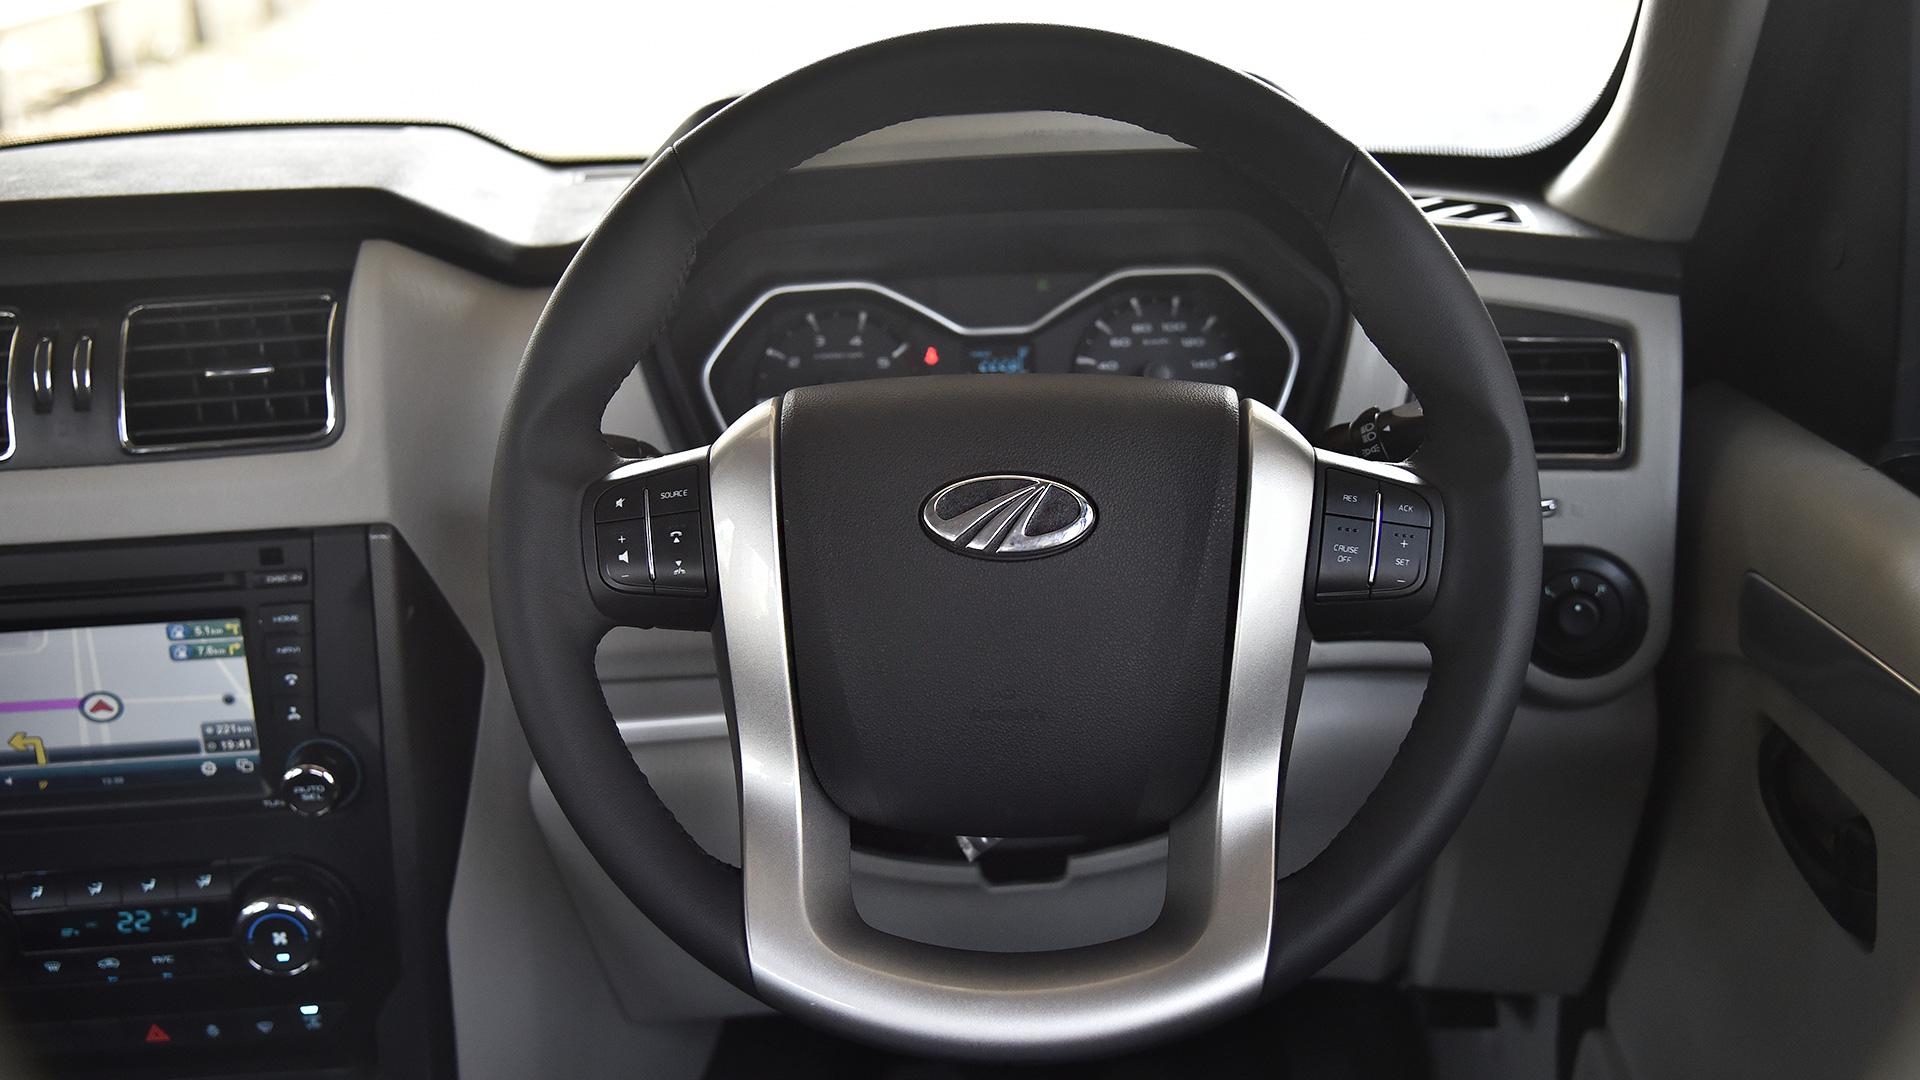 Mahindra Scorpio 2018 S5 Interior Car Photos Overdrive